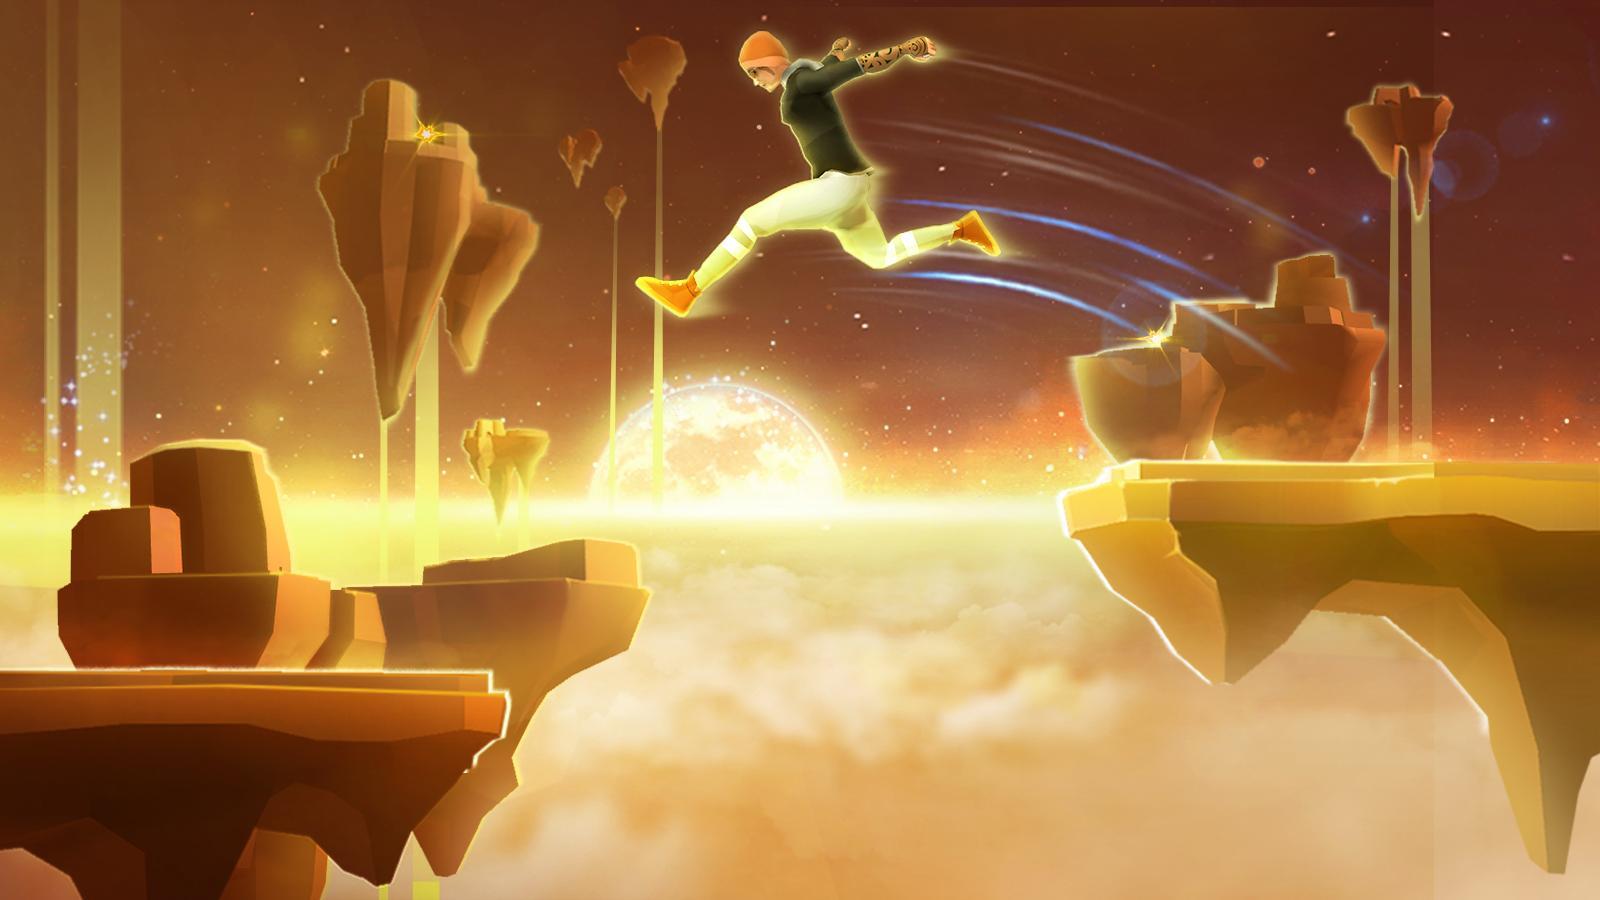 Sky Dancer Run - Running Game 4.2.0 Screenshot 5